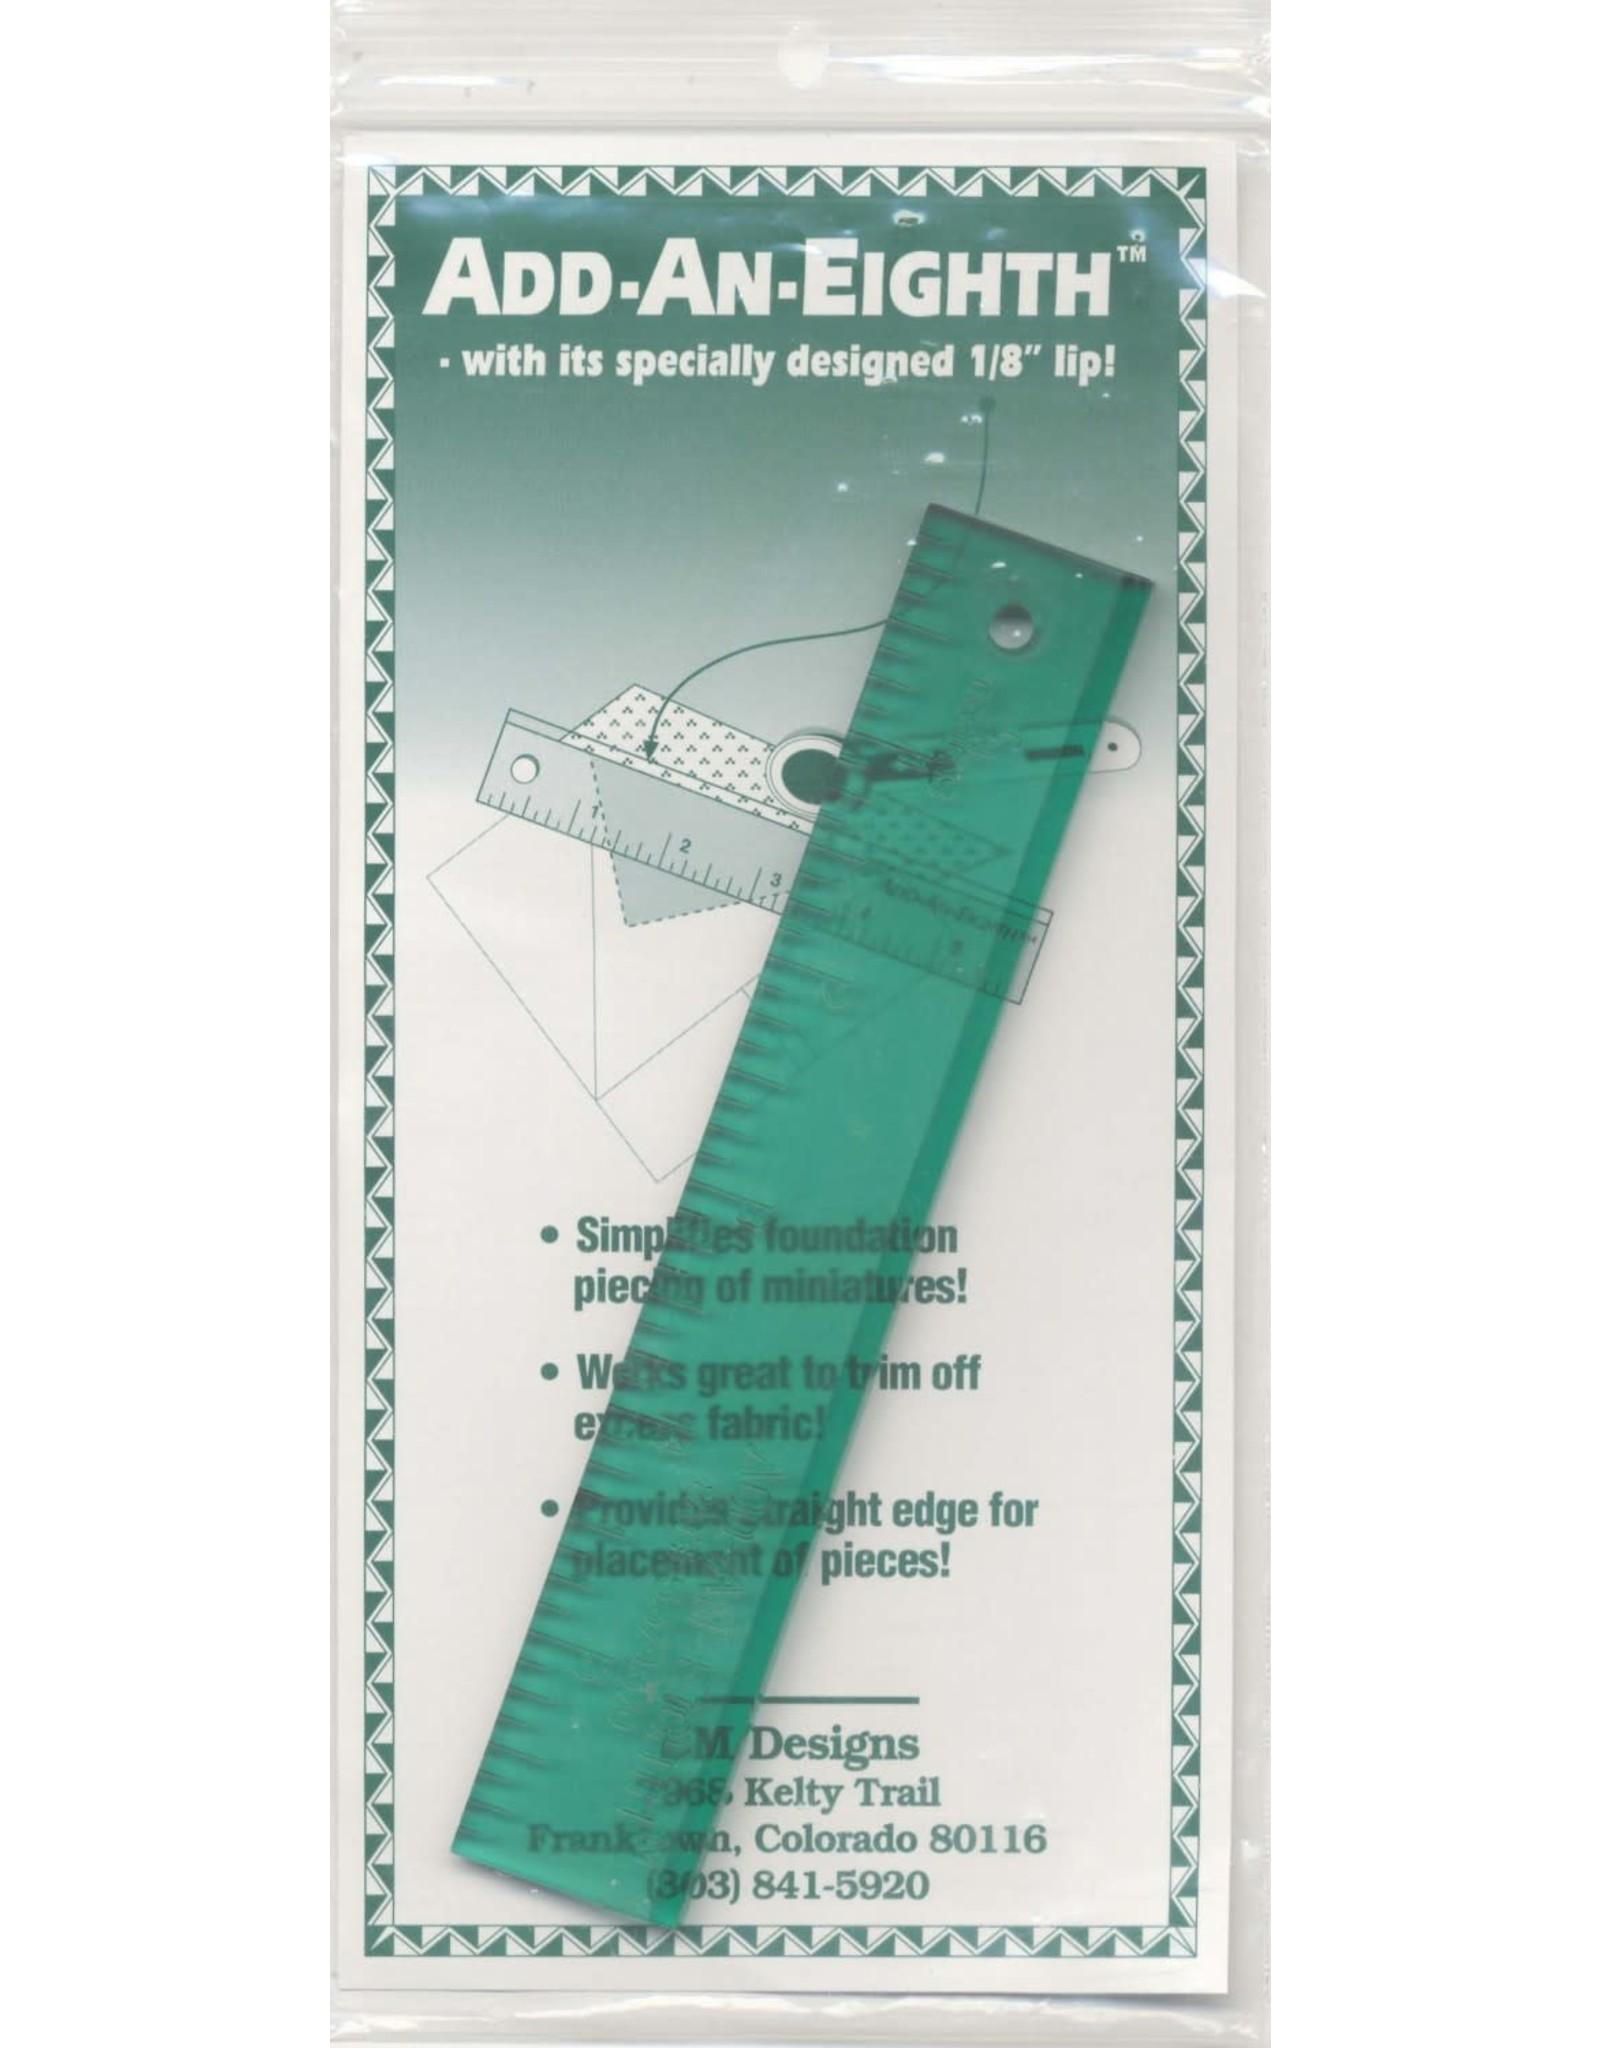 CM Designs Add-an-Eight Ruler - 1 x 6 inch